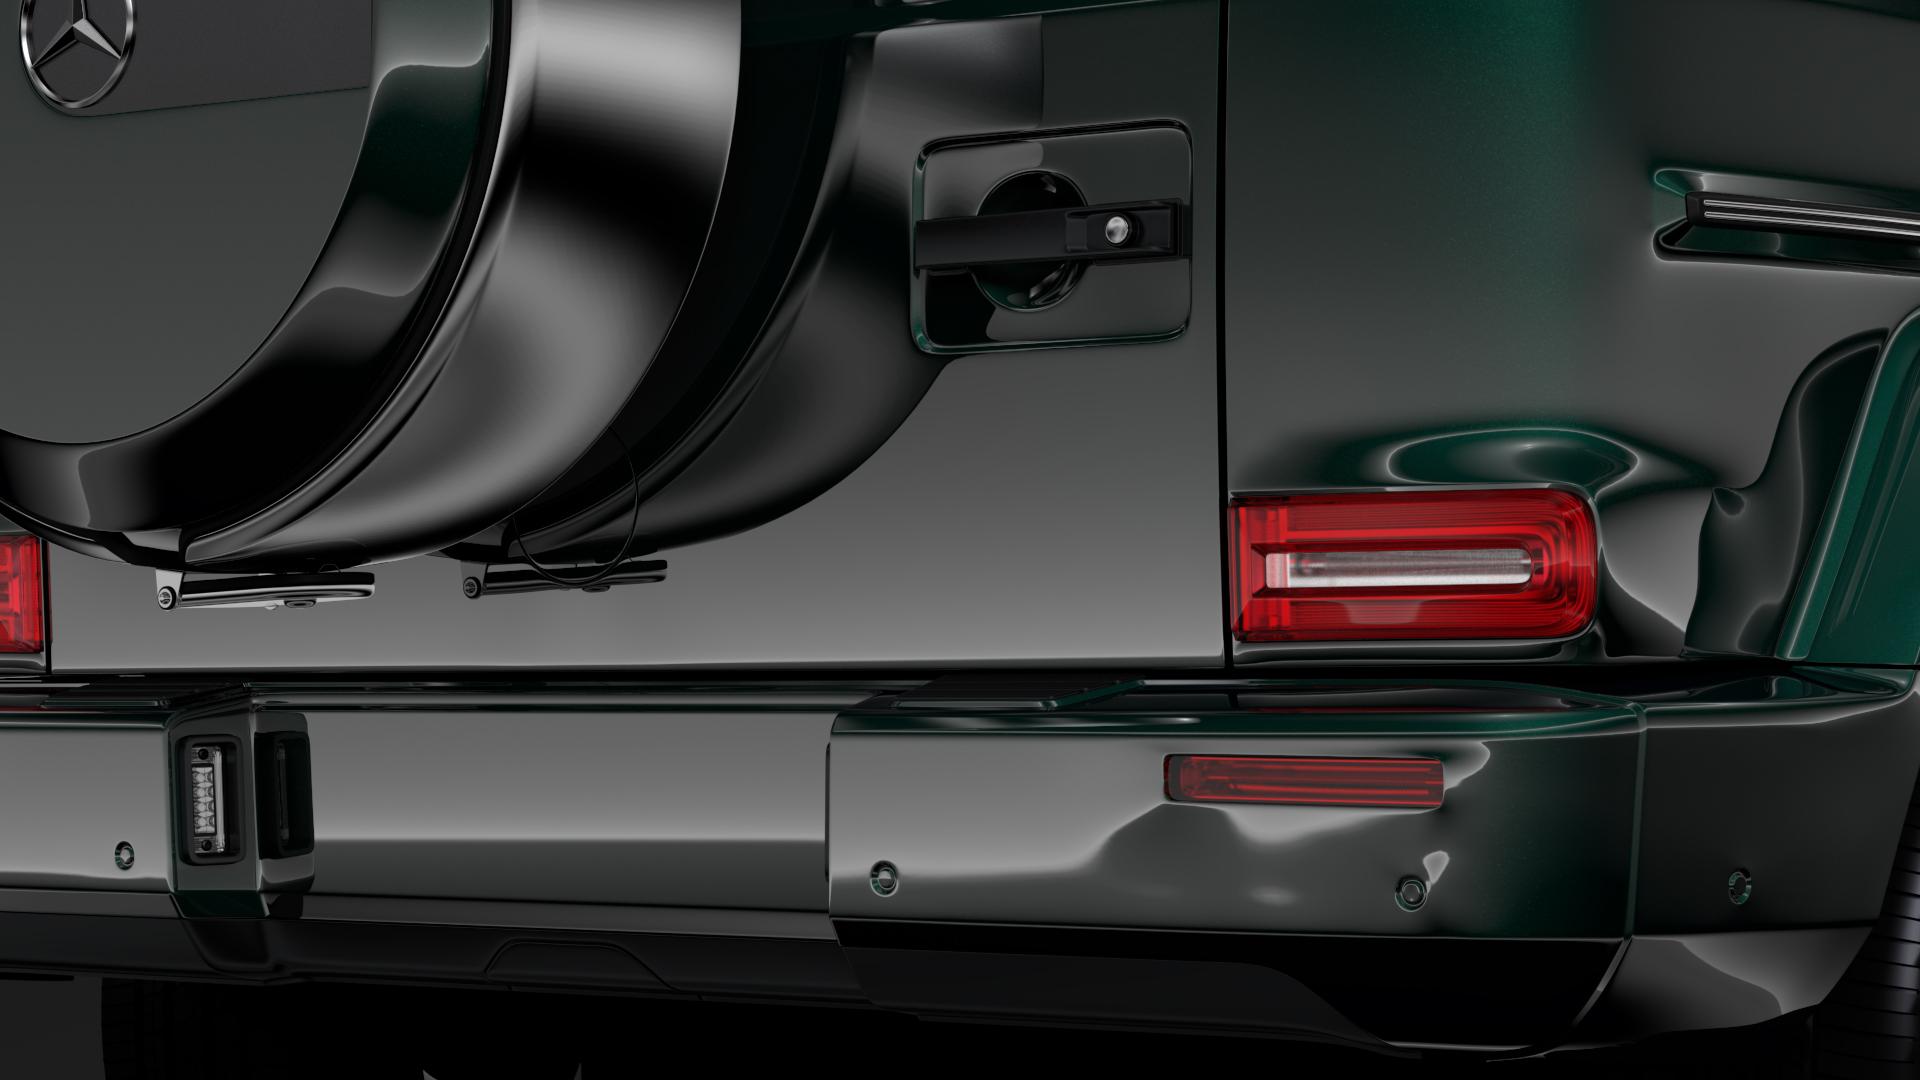 mercedes-benz g 550 (w464) 2018 3d model max fbx c4d lwo ma mb hrc xsi obj 277665